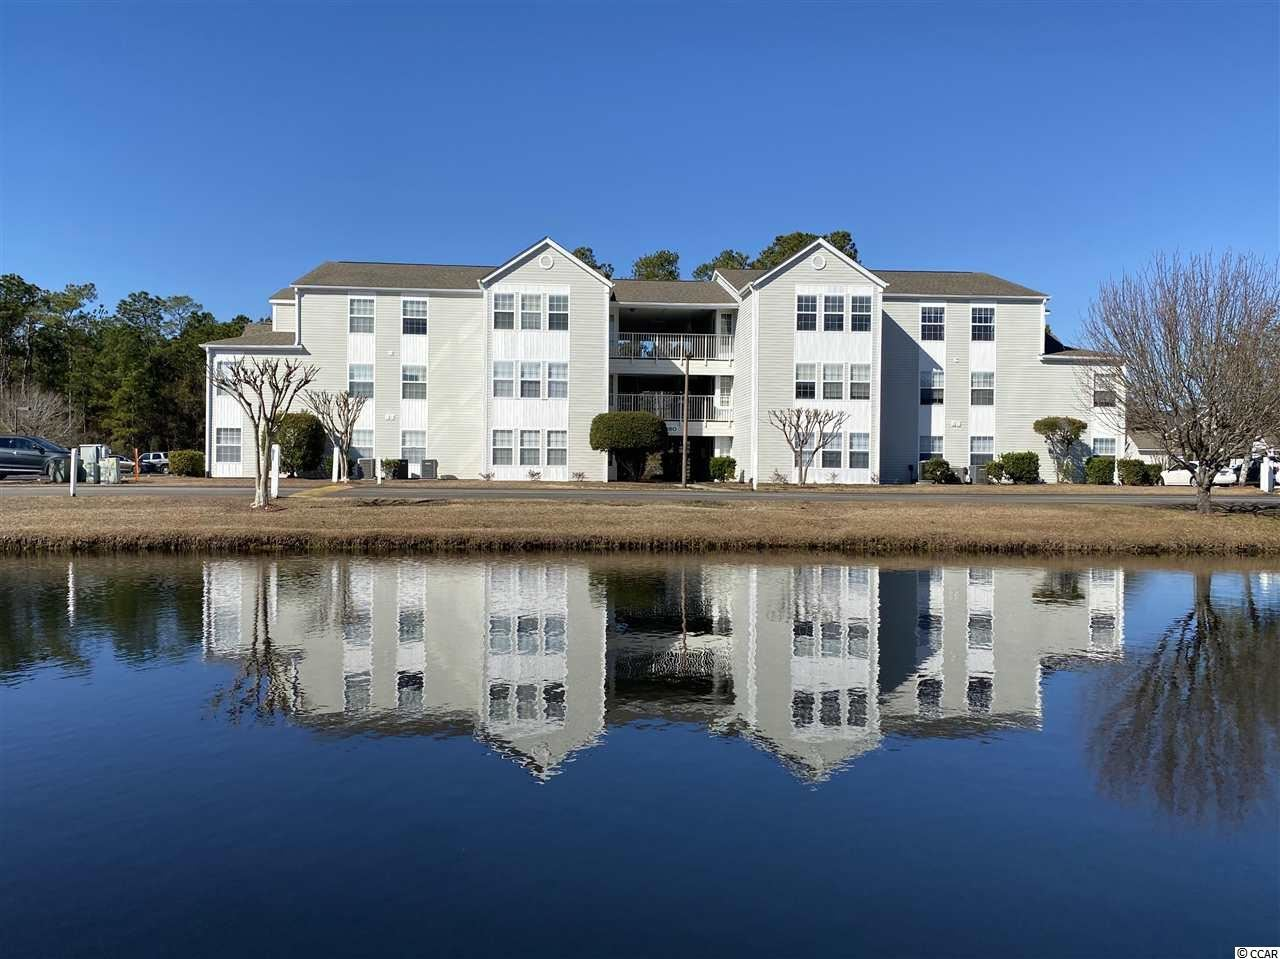 2280 Andover Dr. #J, Myrtle Beach, SC 29575 - MLS#: 2101458